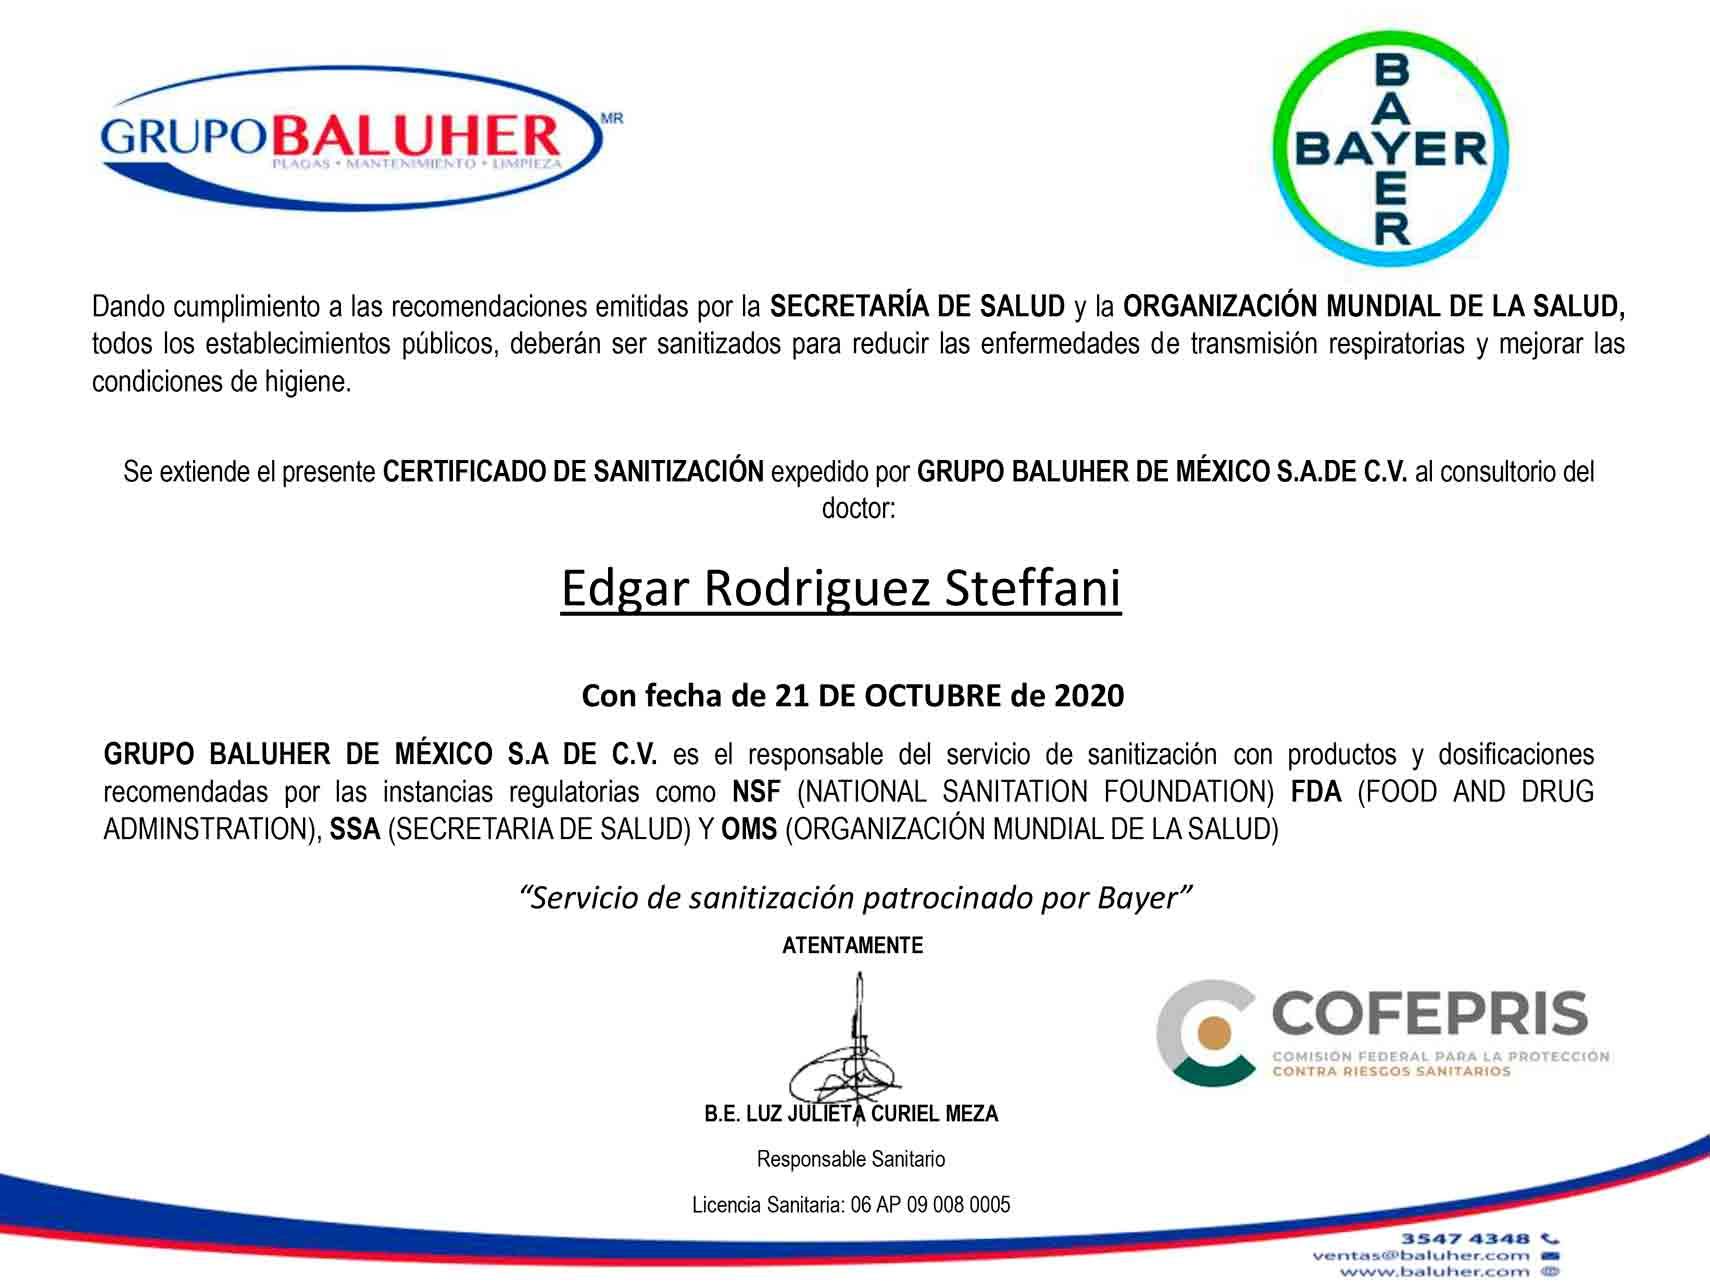 Certificado de Sanitazación